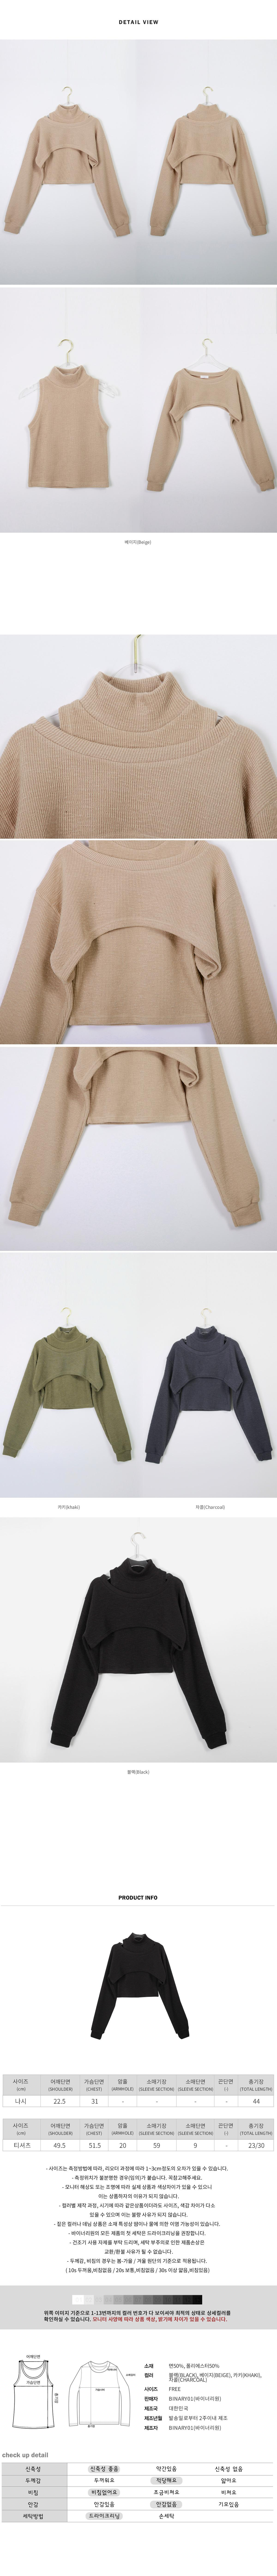 Cand Paulanasi & Cropped T-shirt